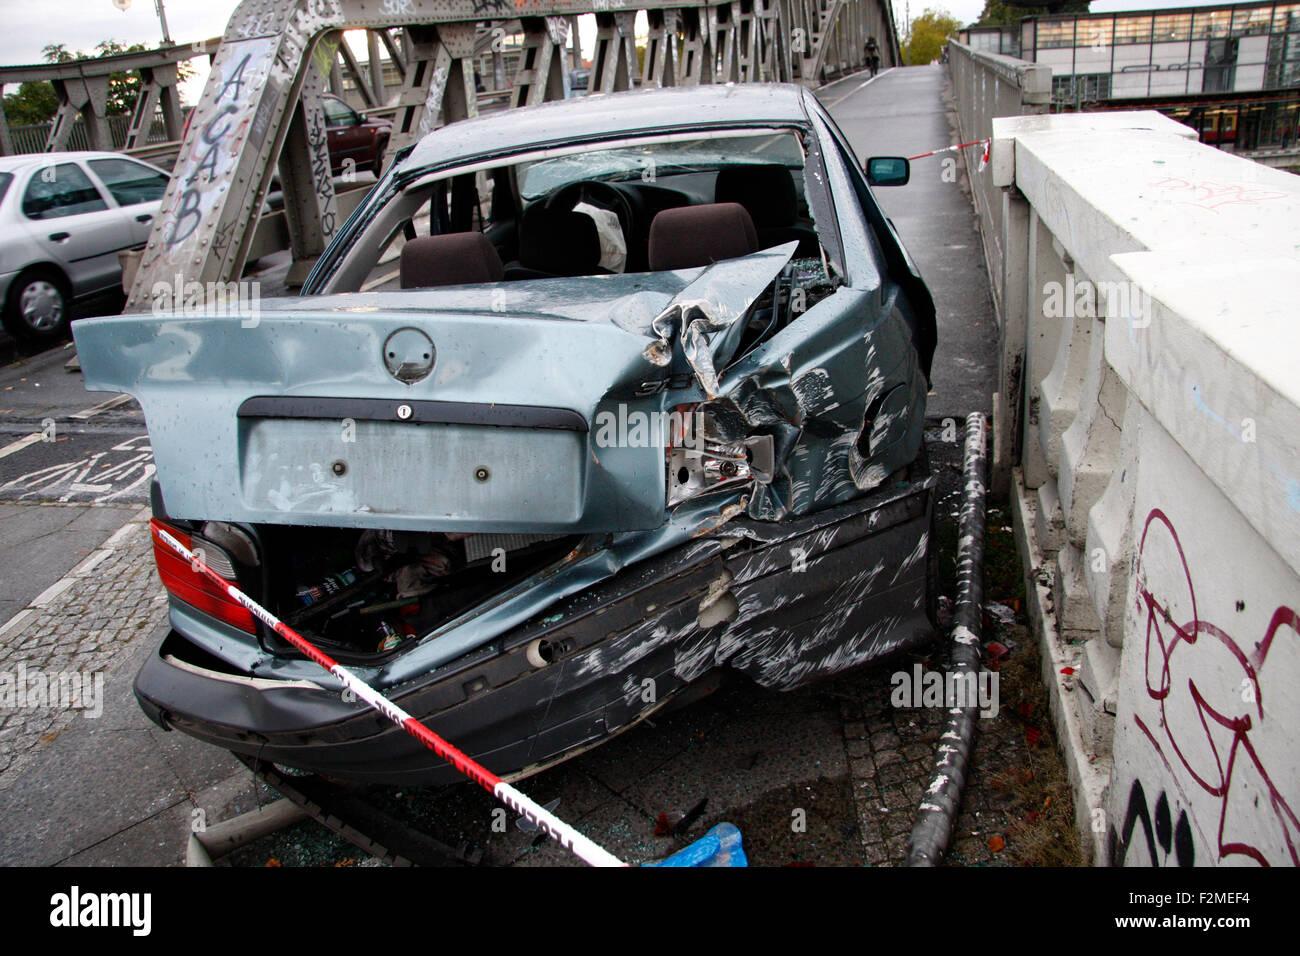 Autowrack an der Bornholmer Bruecke, Berlin-Prenzlauer Berg. - Stock Image